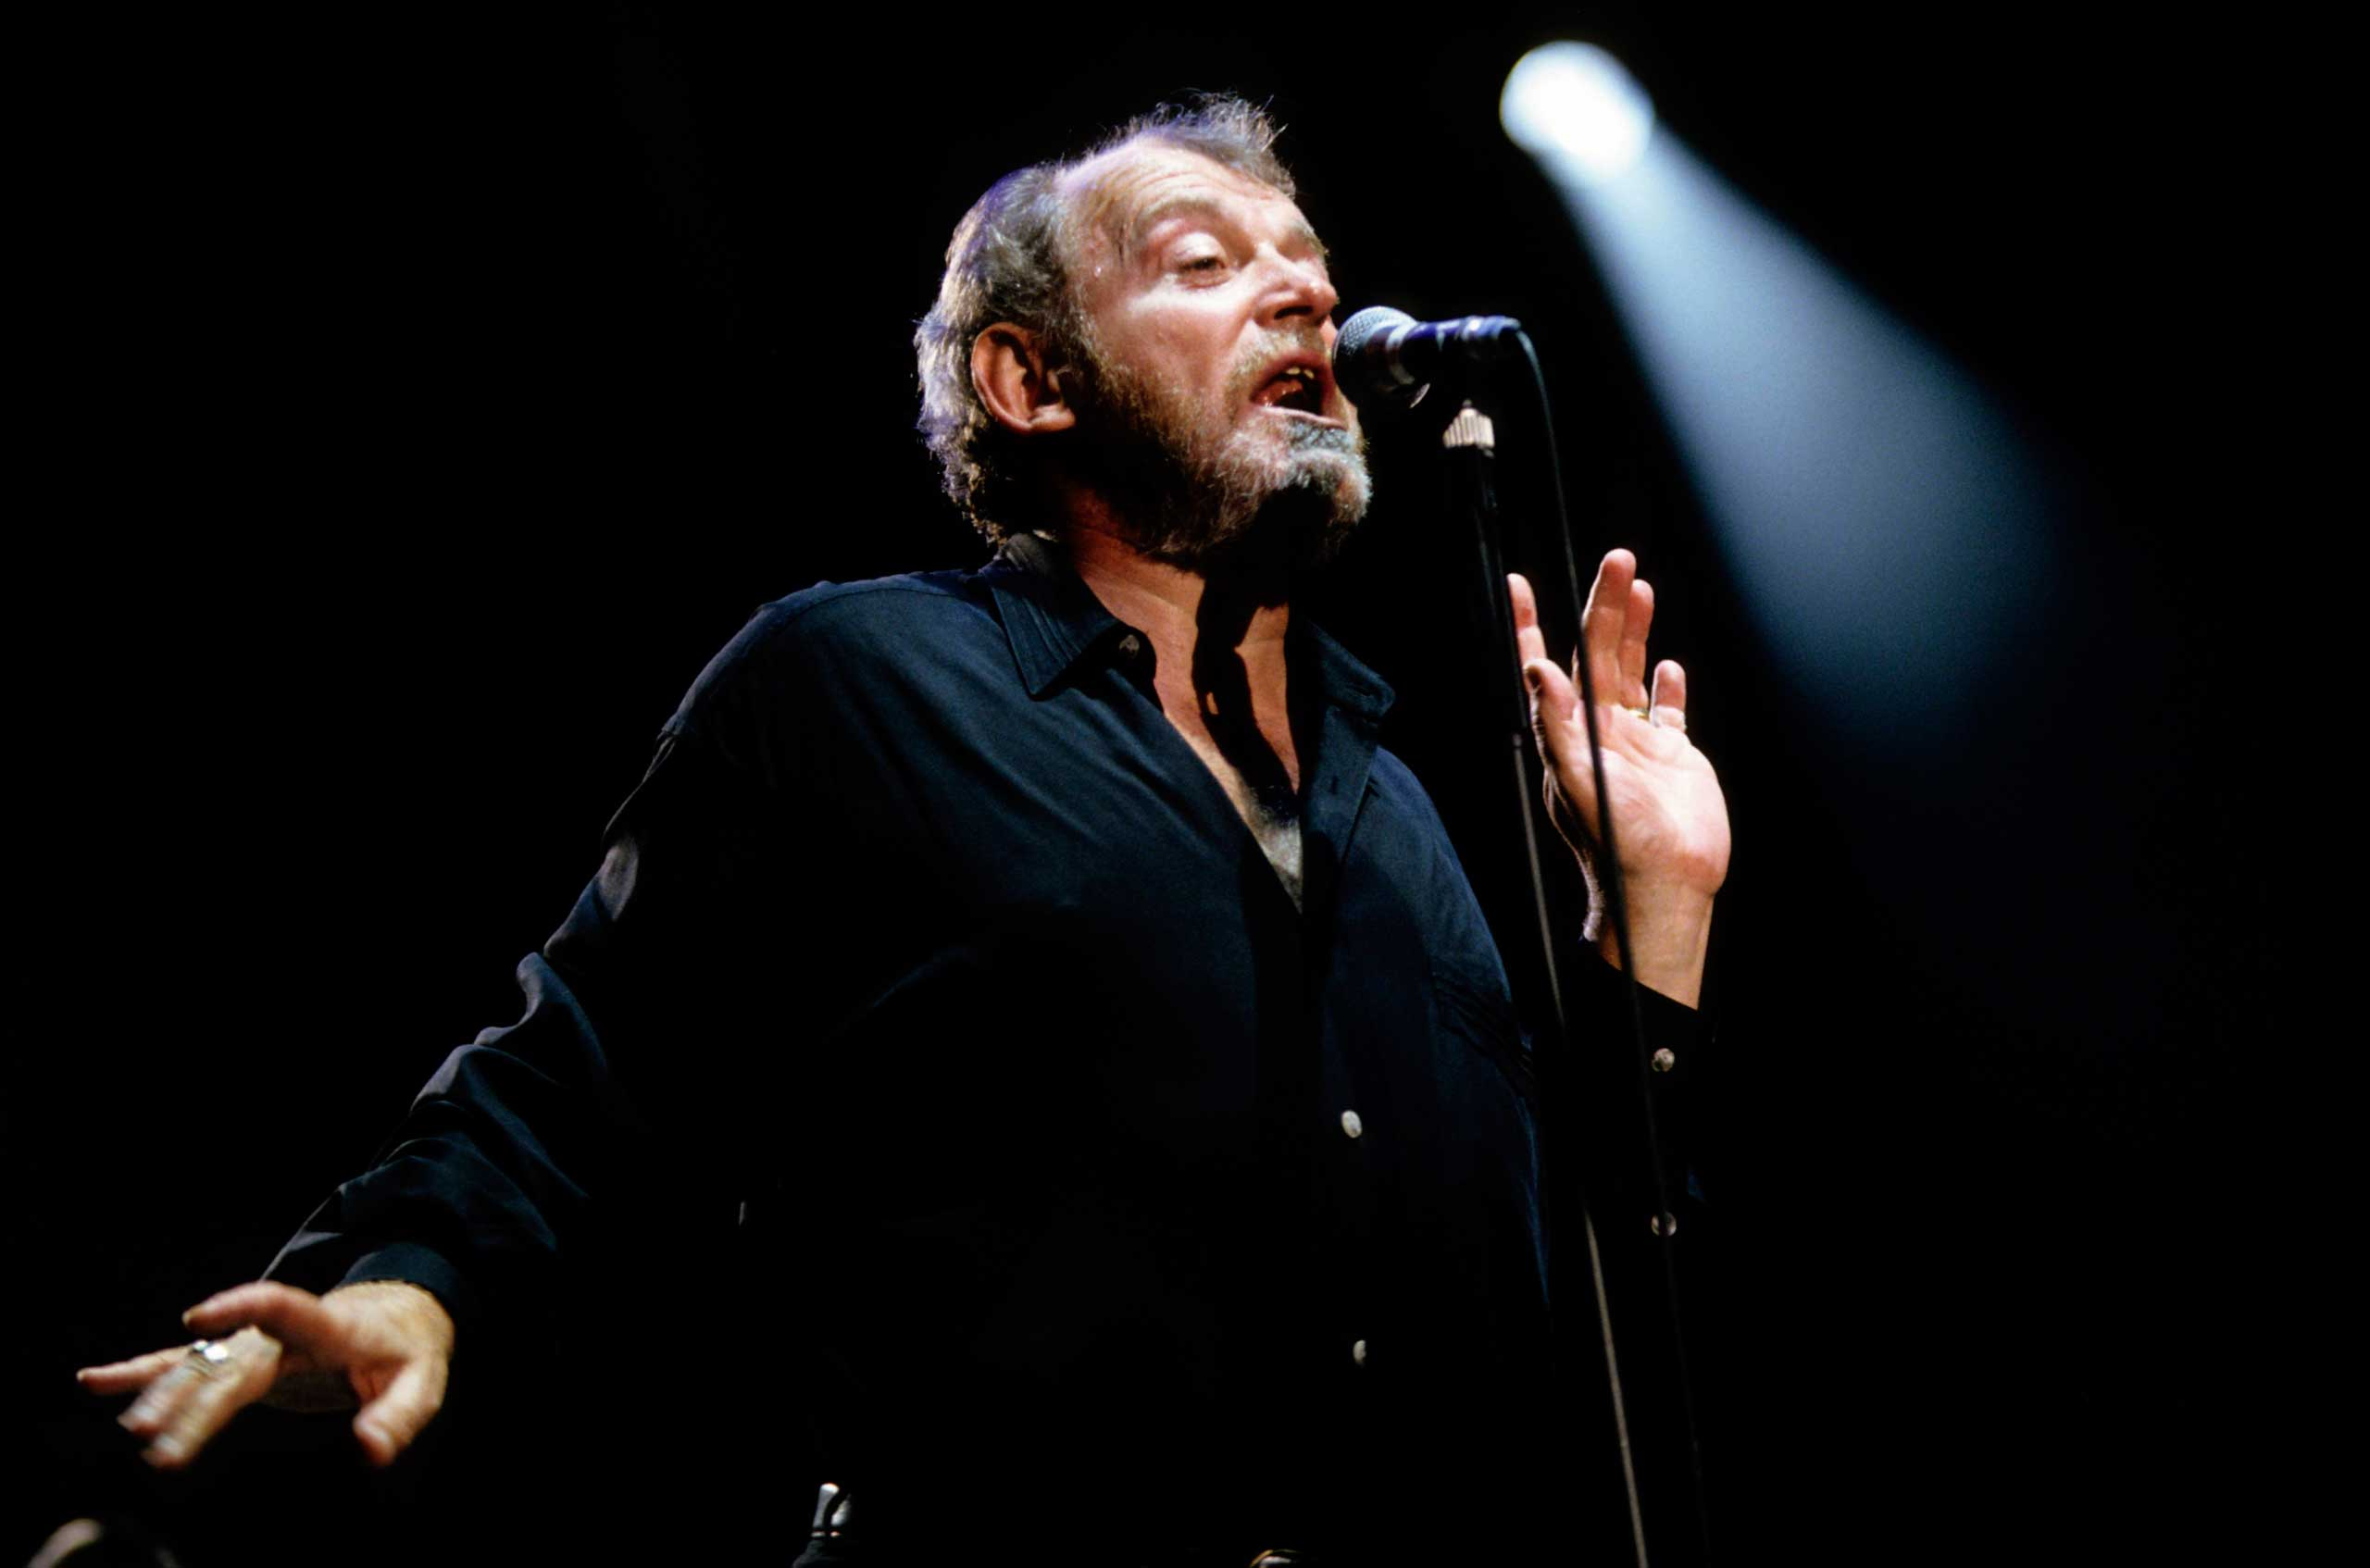 Joe Cocker performs in the UK in 1990.